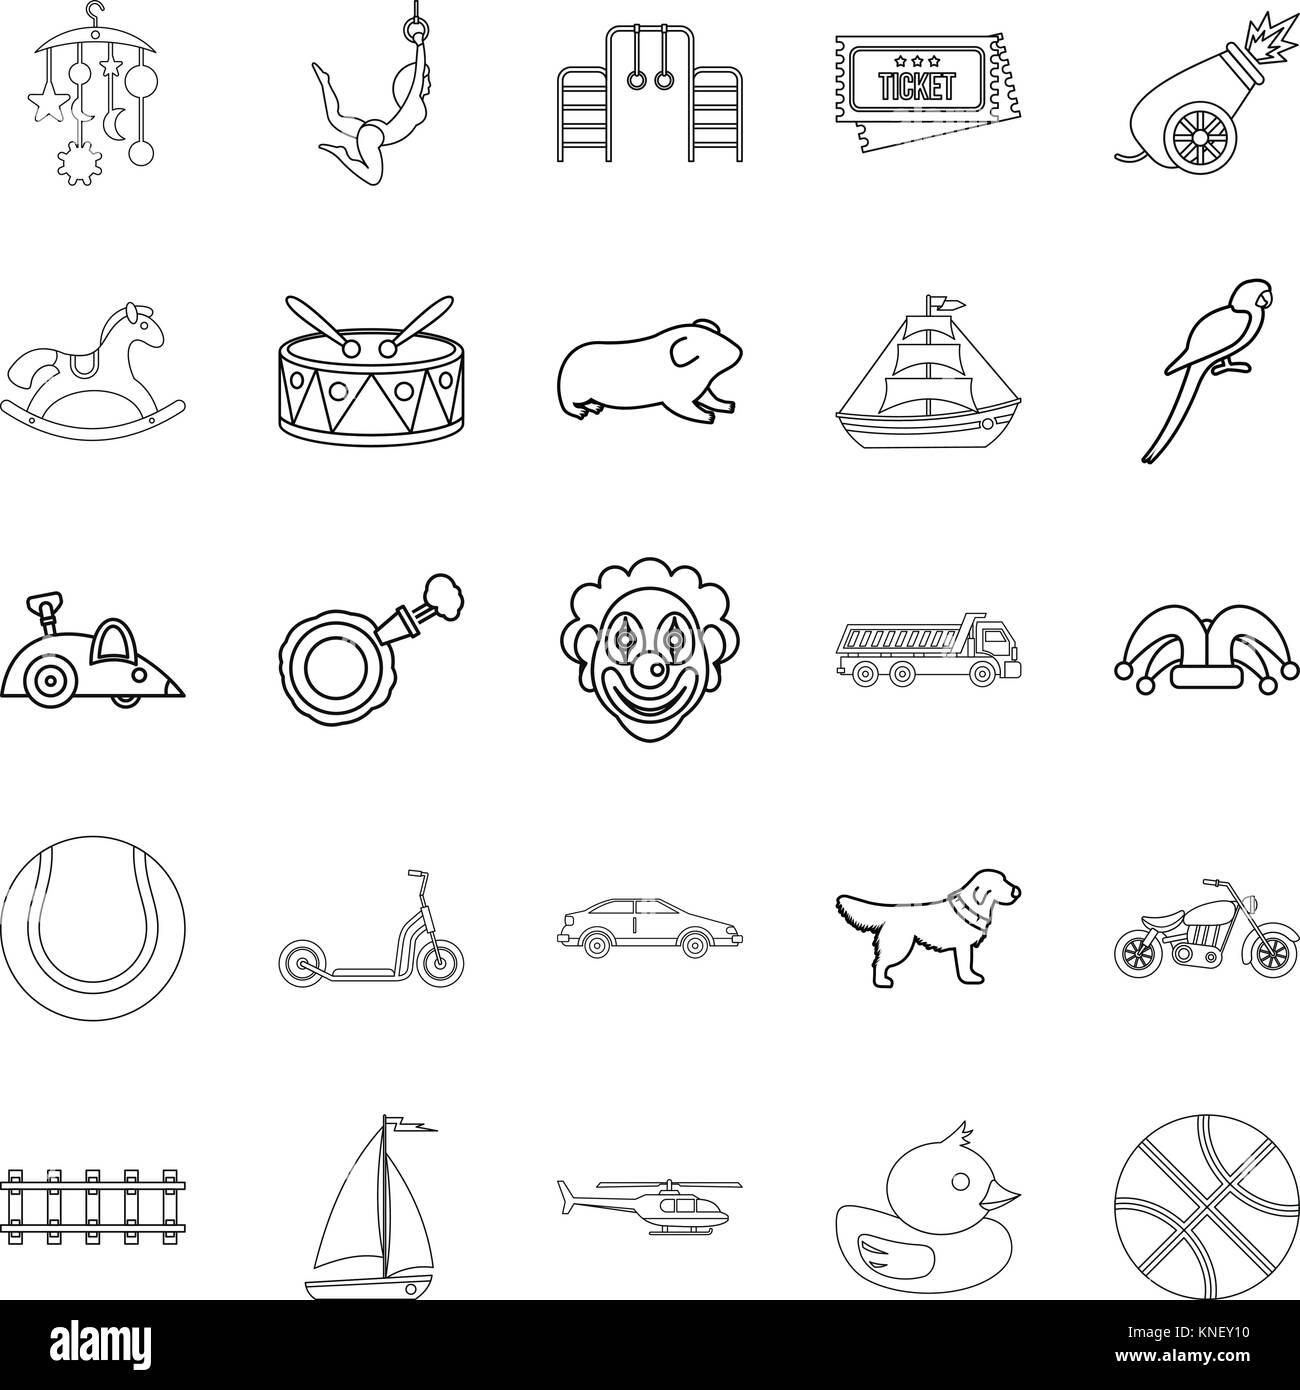 Puerility icons set, outline style - Stock Image